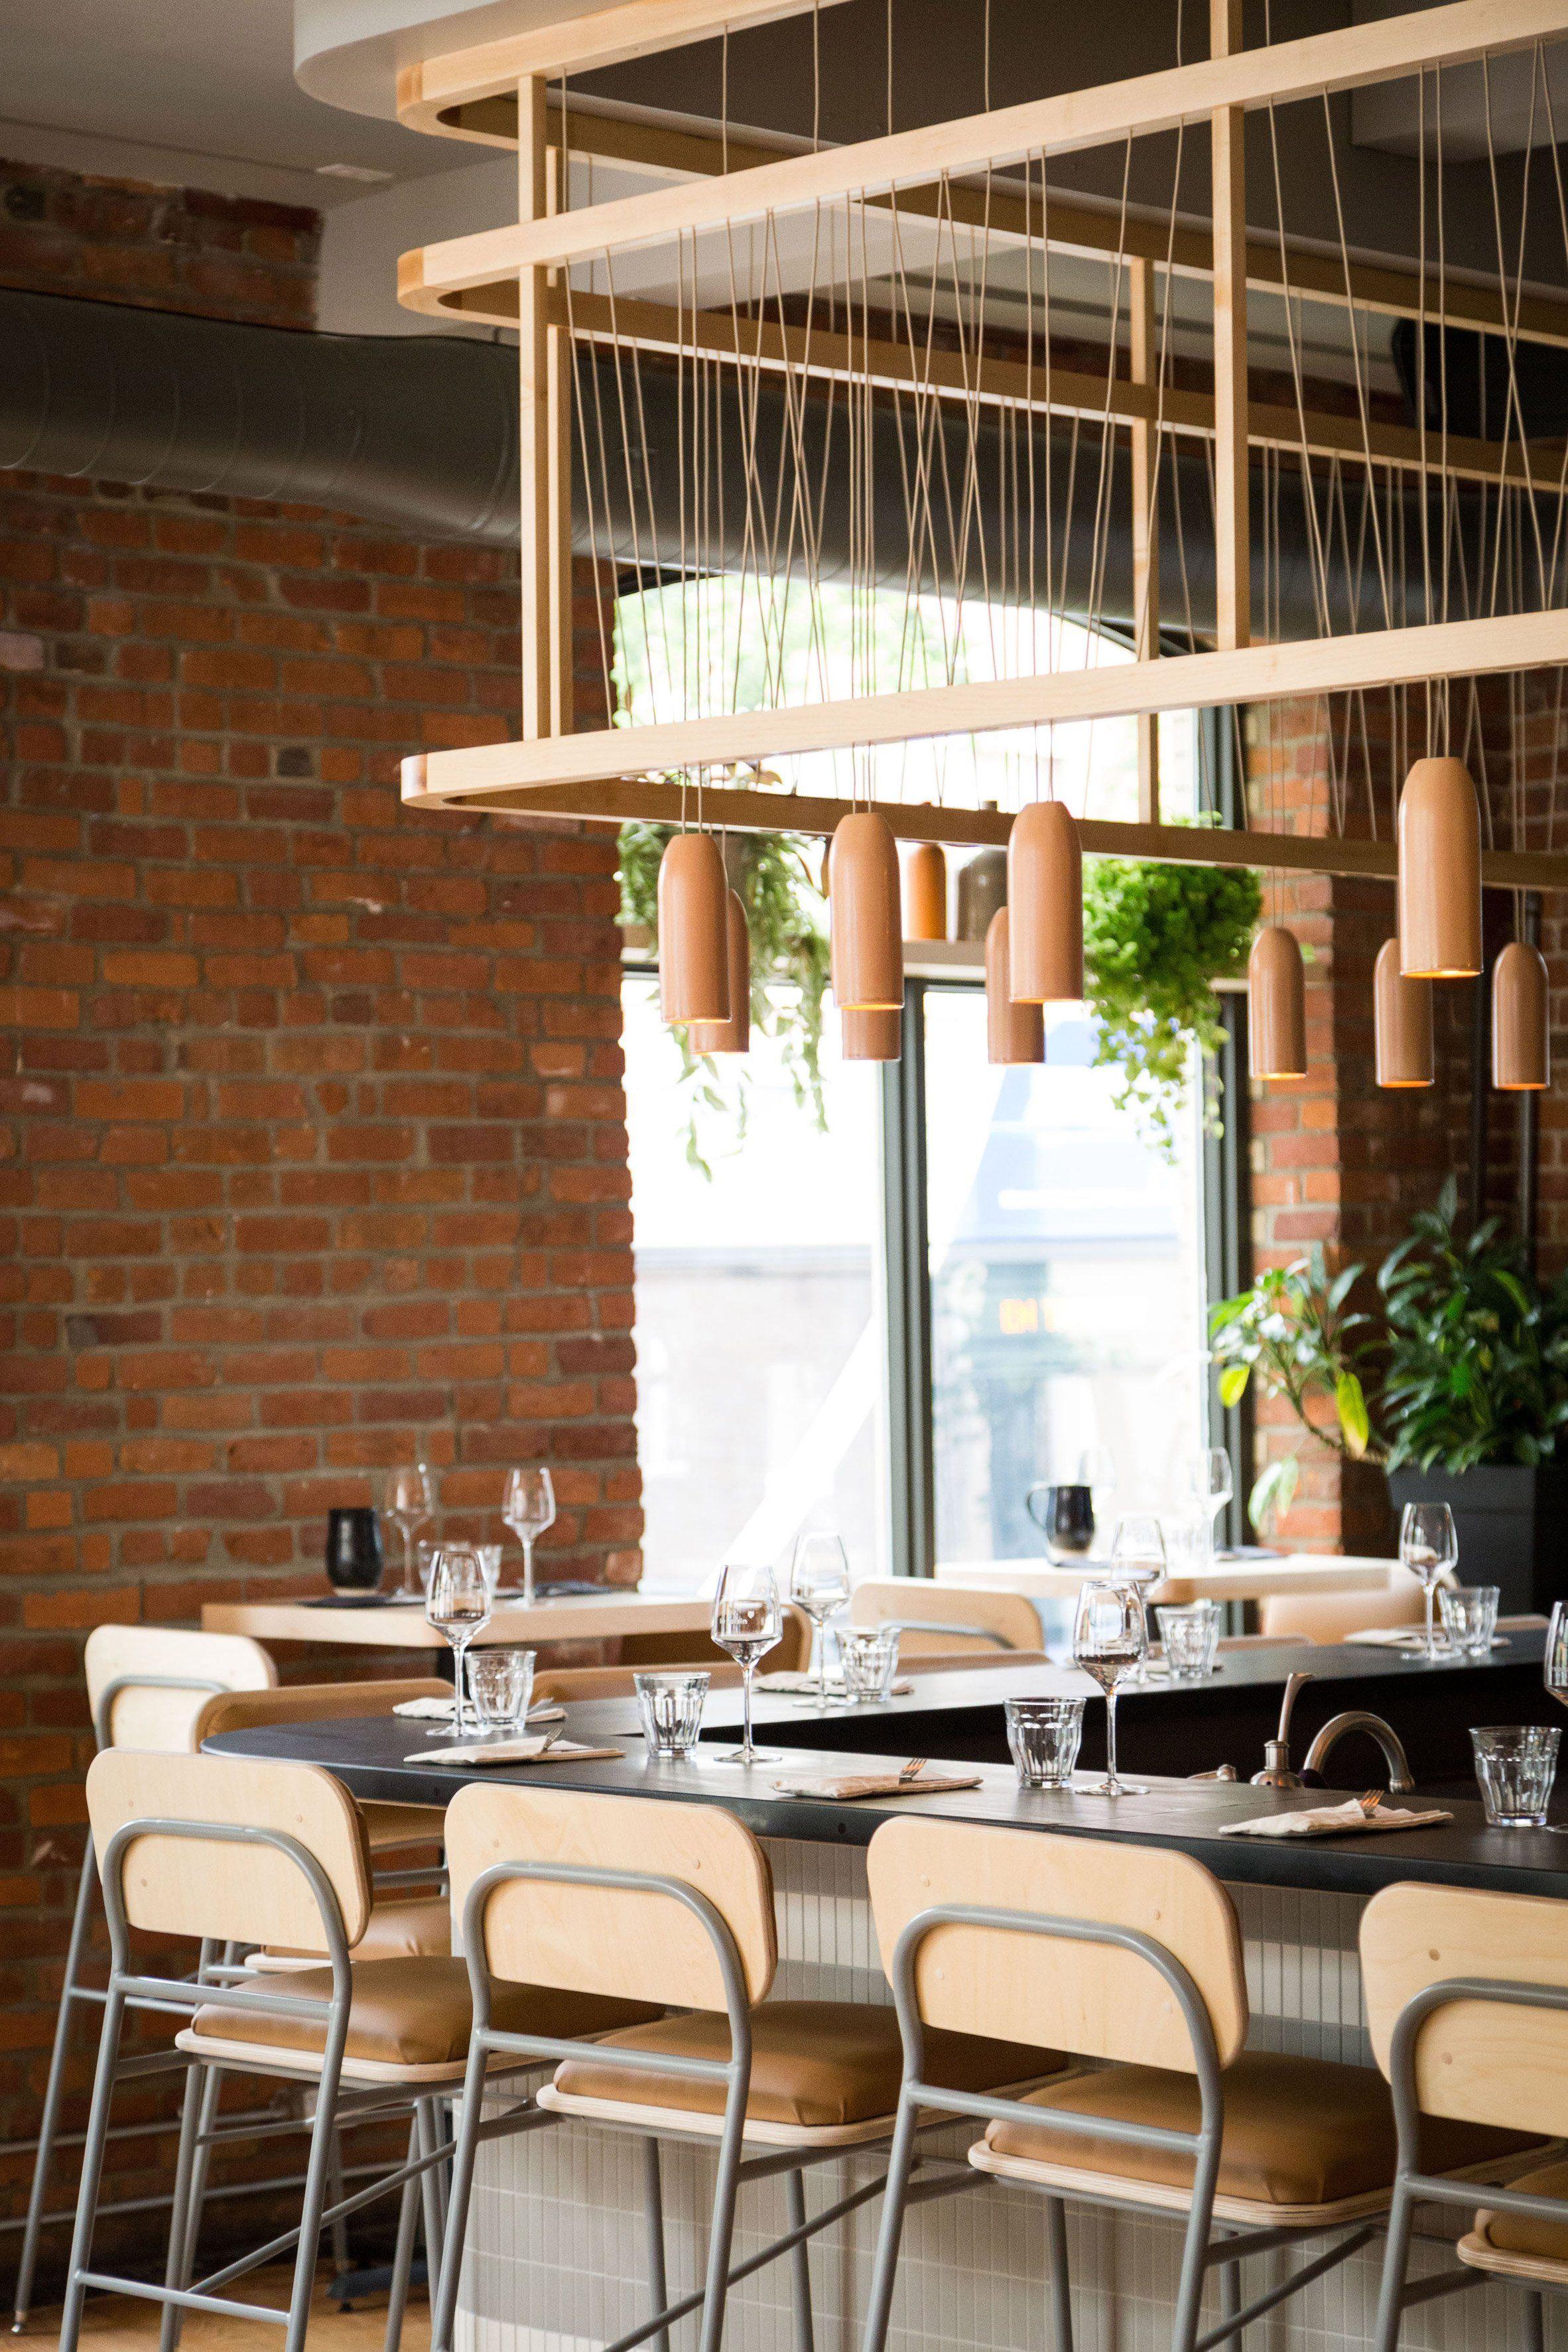 Atelier Filz Designs Bespoke Lighting And Chairs For Restaurant In Quebec City Restaurant Design Restaurant Interior Restaurant